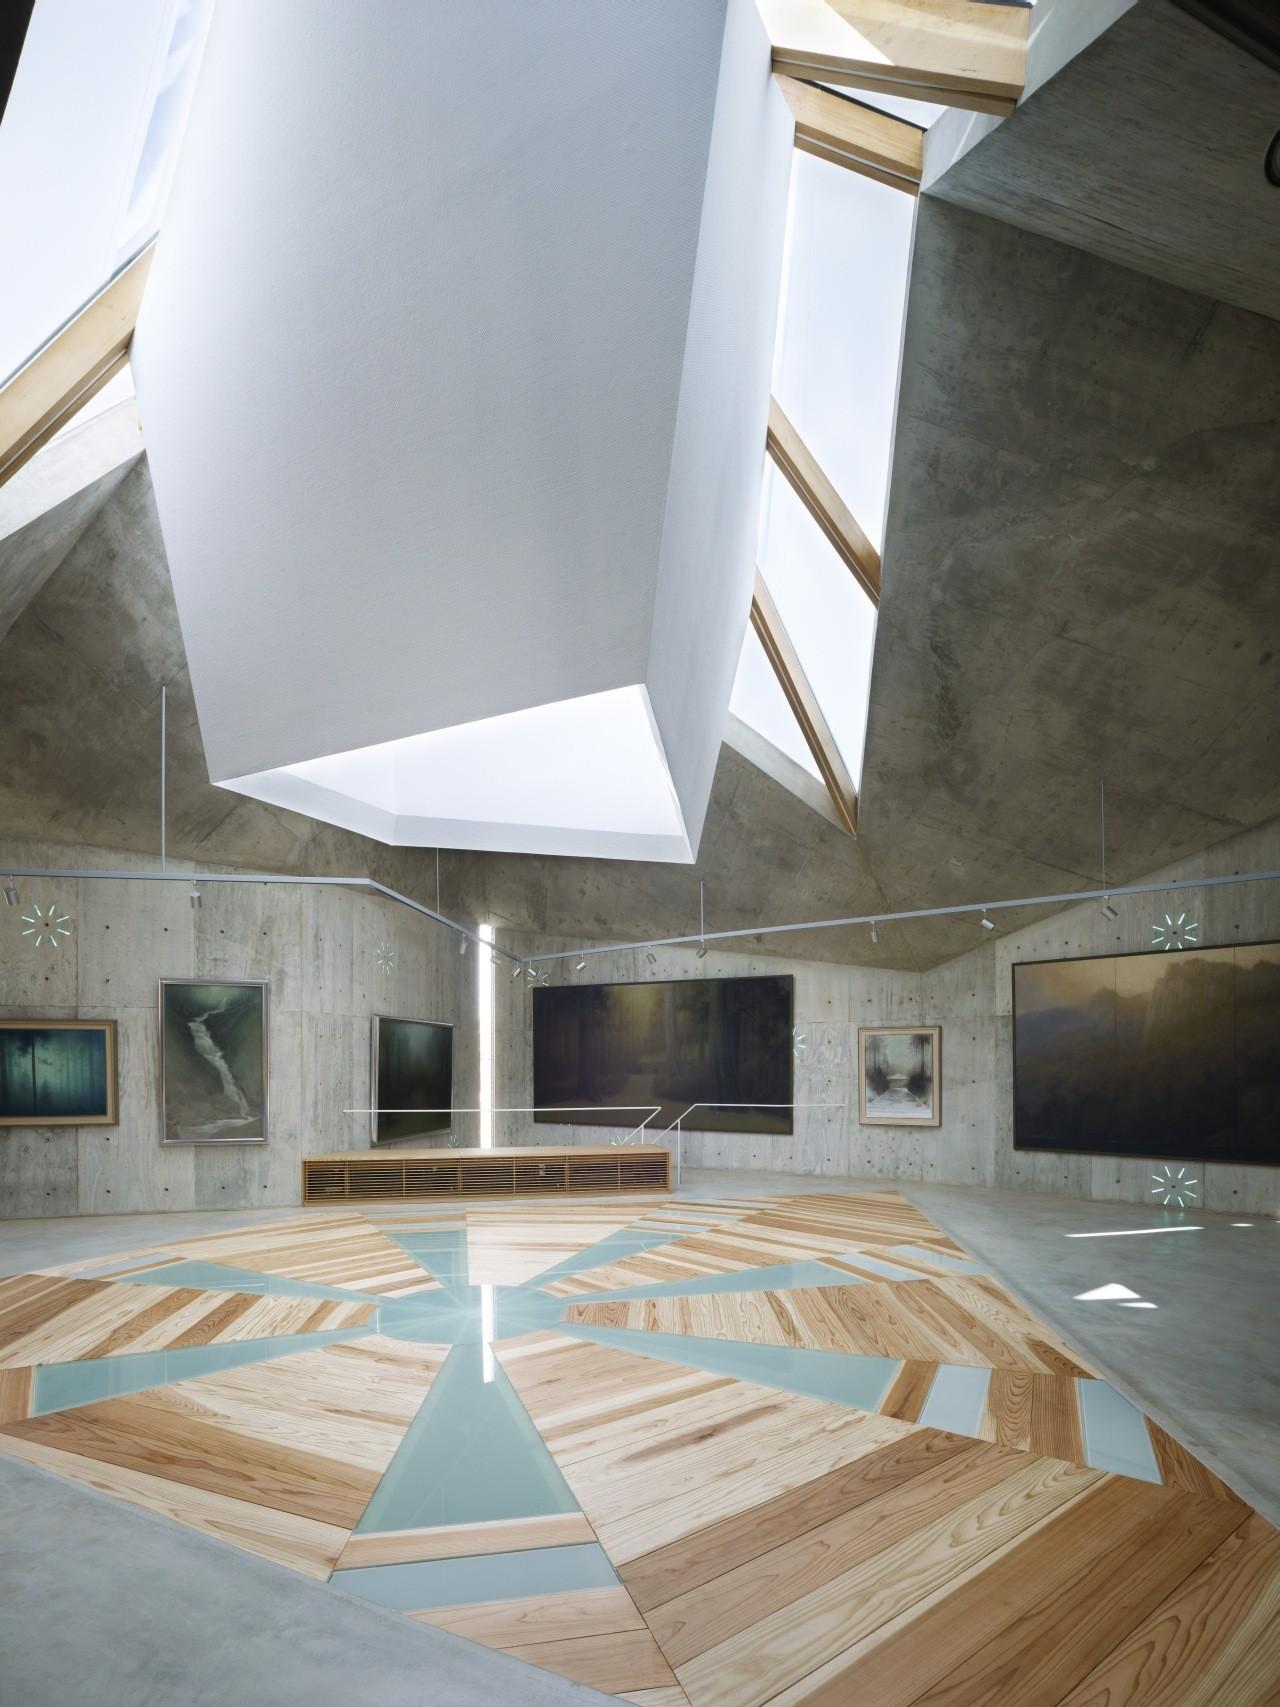 Gallery Of Mecenat Art Museum Naf Architect Amp Design 9